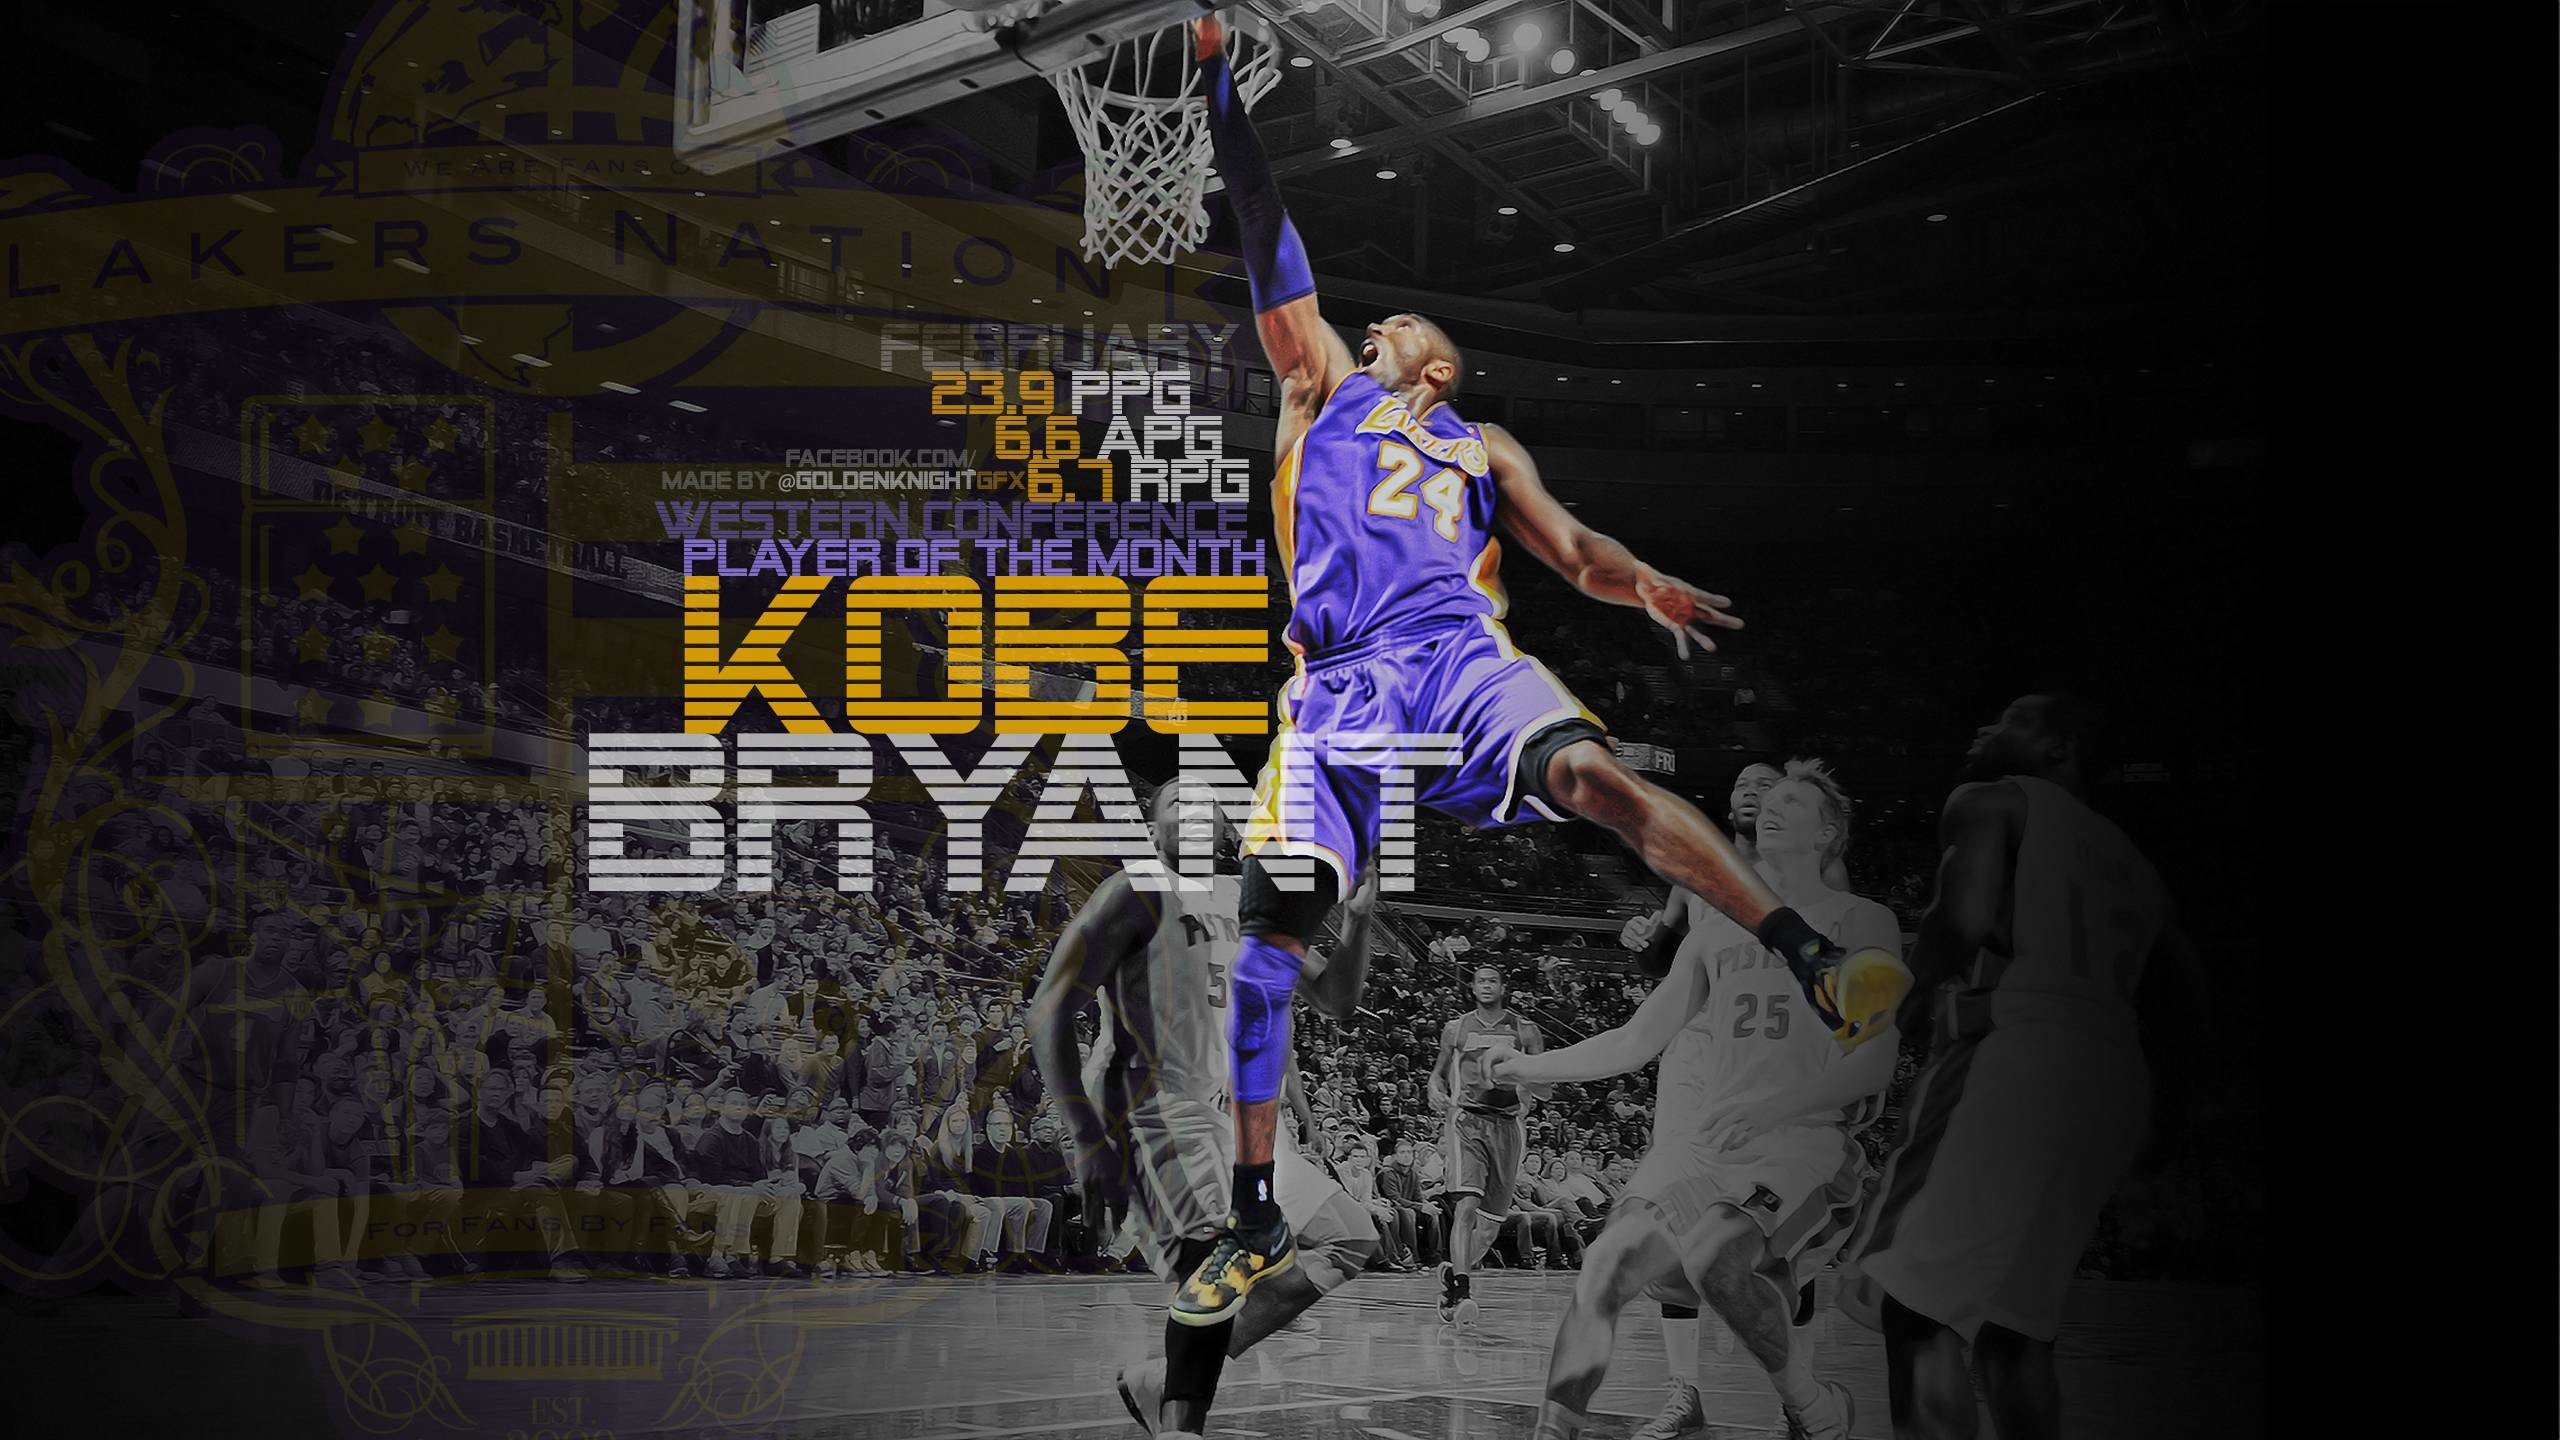 … Kobe Bryant Wallpapers HD 2015 – Wallpaper Gallery …